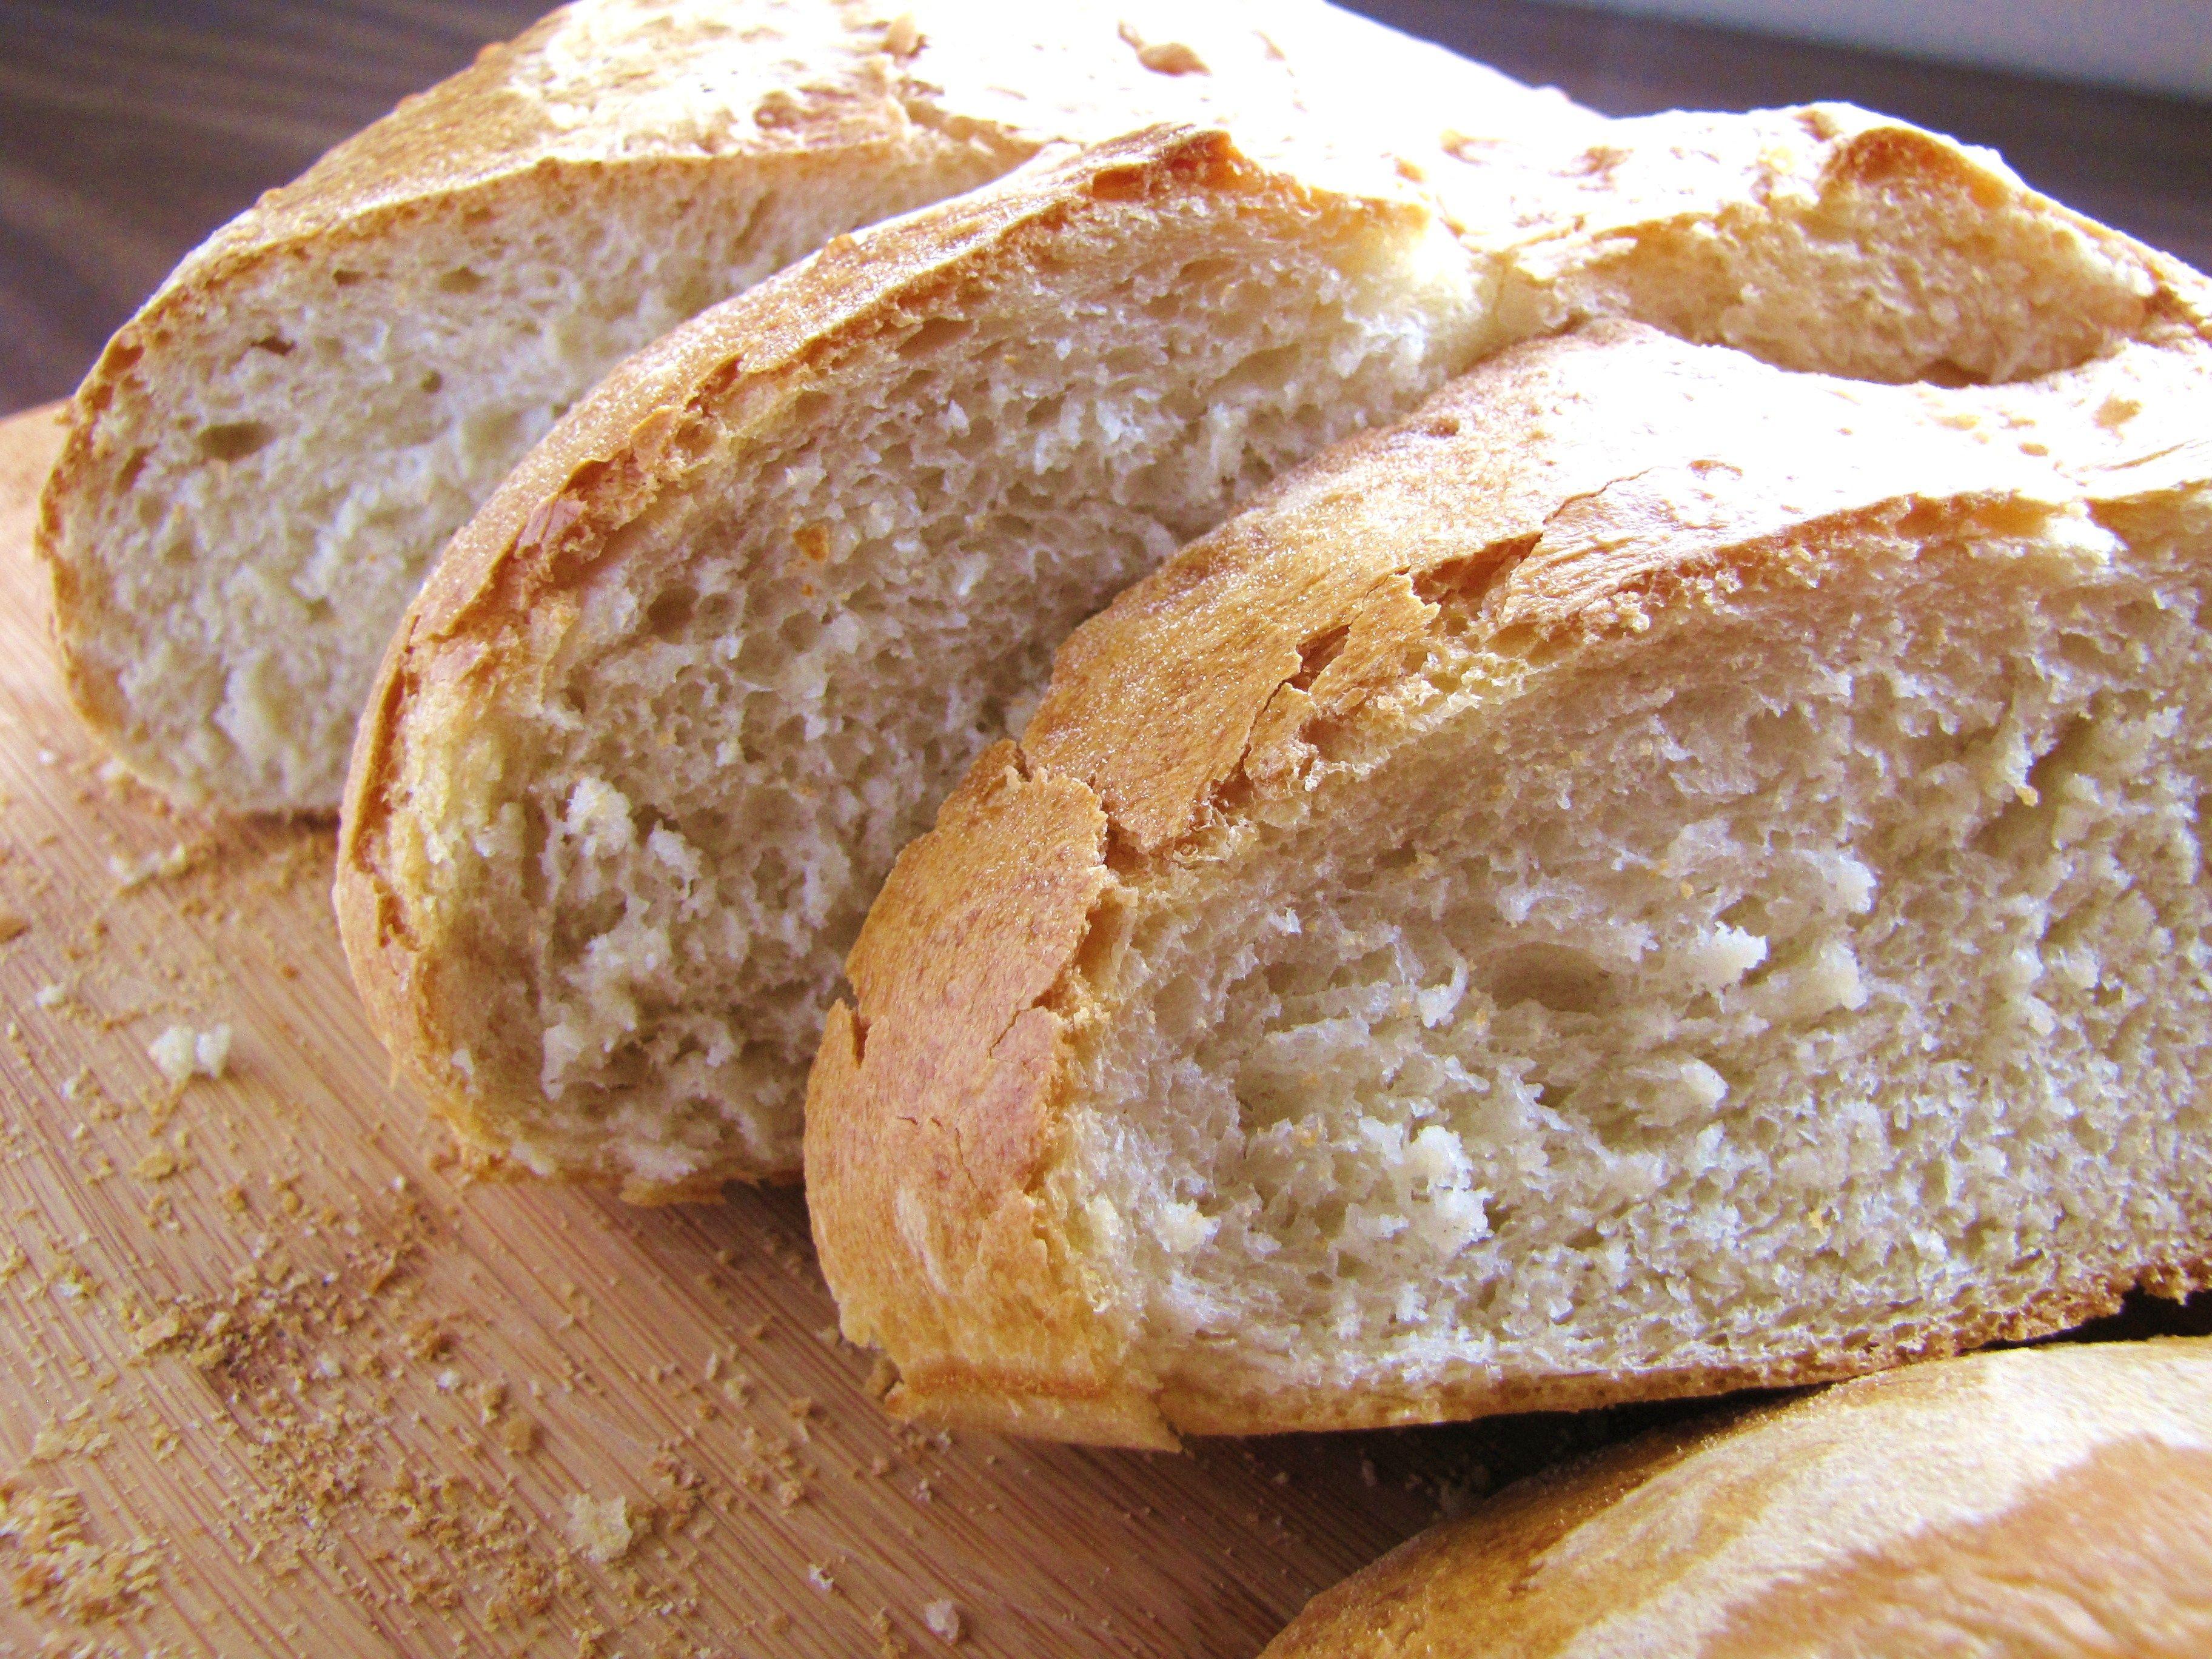 Sourdough Bread Ingredients  Bread Machine Sourdough recipe – All recipes Australia NZ